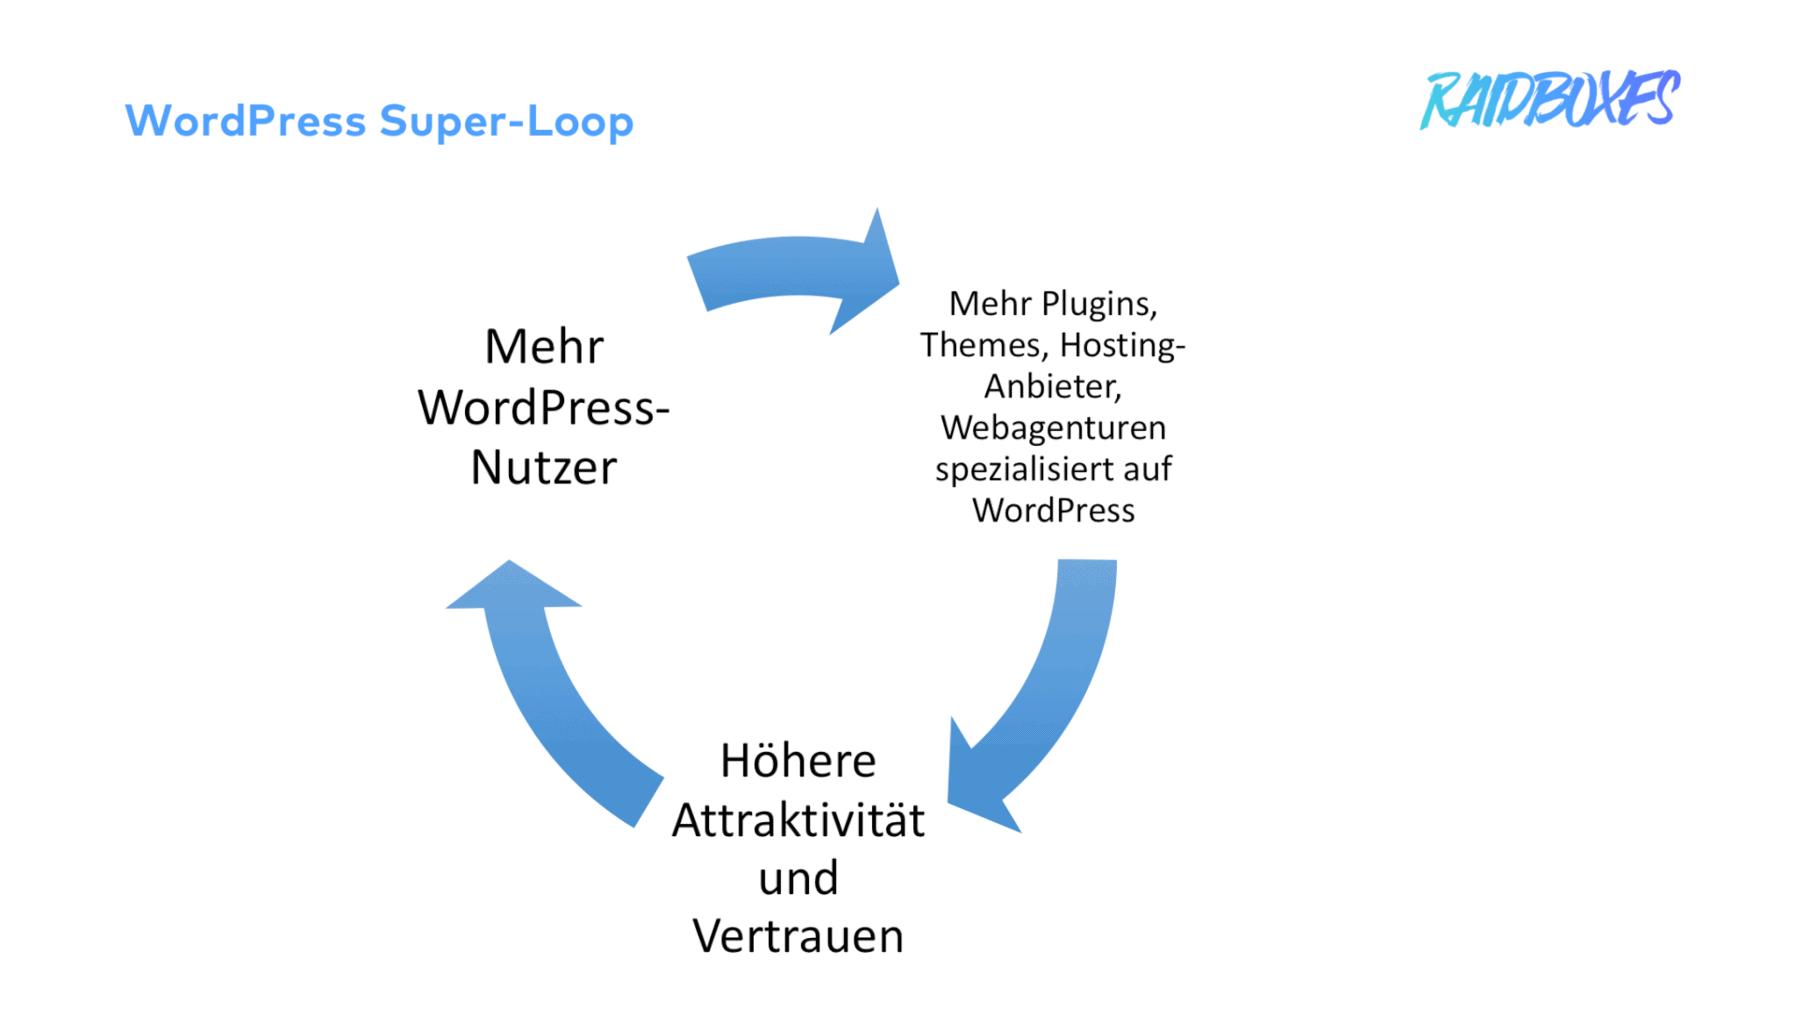 Der WordPress Super-Loop